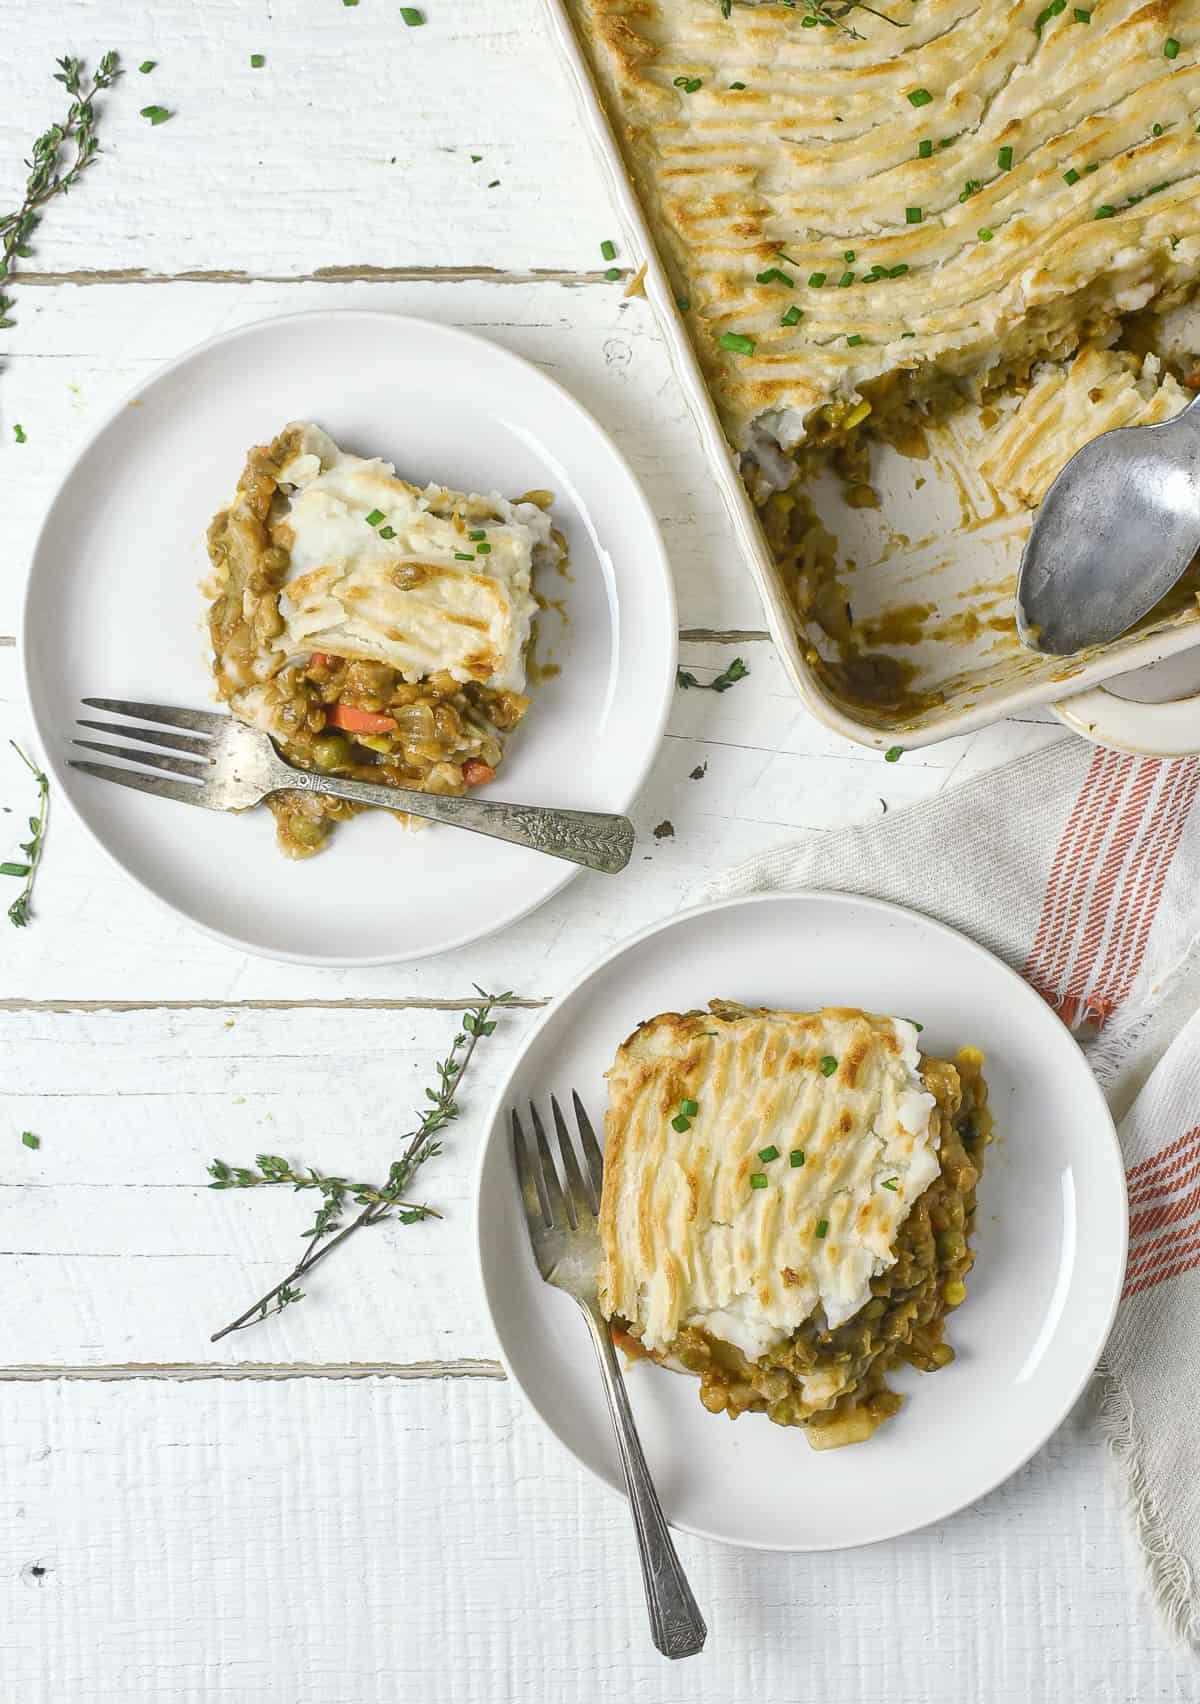 Two plates with vegan lentil shepherd's pie.